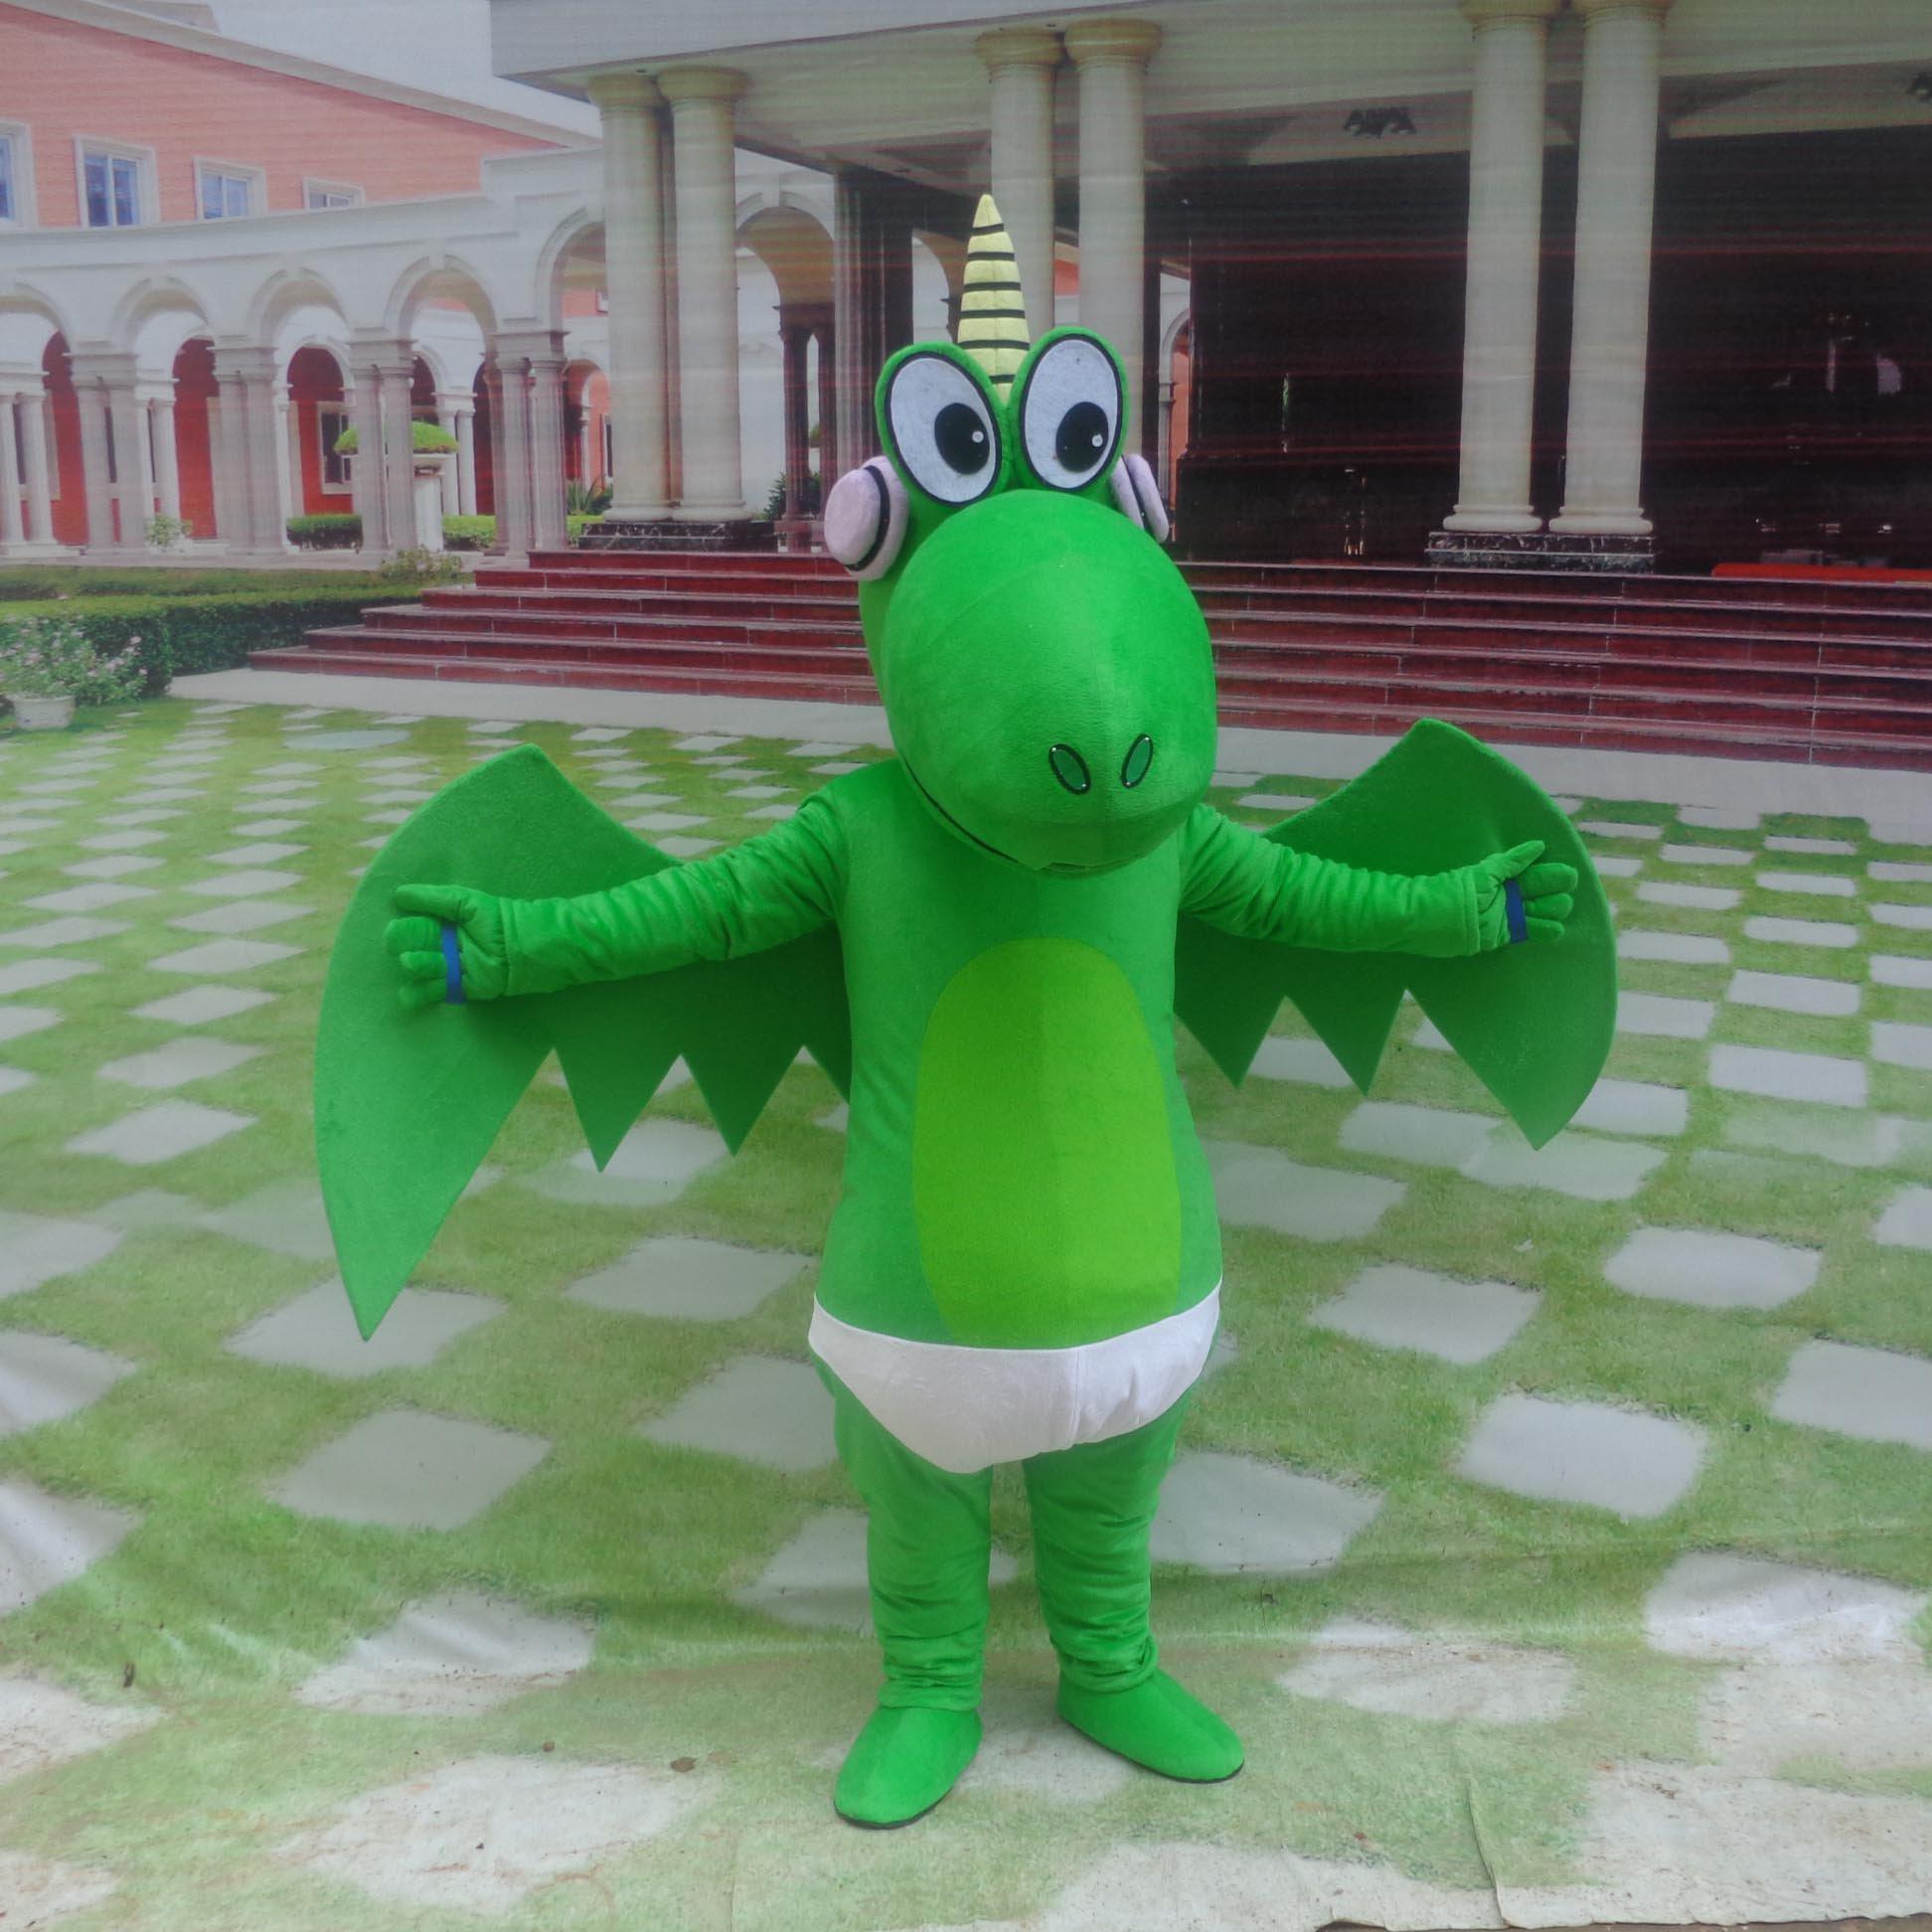 Cartoon Doll Clothing Cartoon Walking Doll Clothing Cartoon Show Clothing Plush Cartoon Dolls Clothes Dragon Mascot Costume